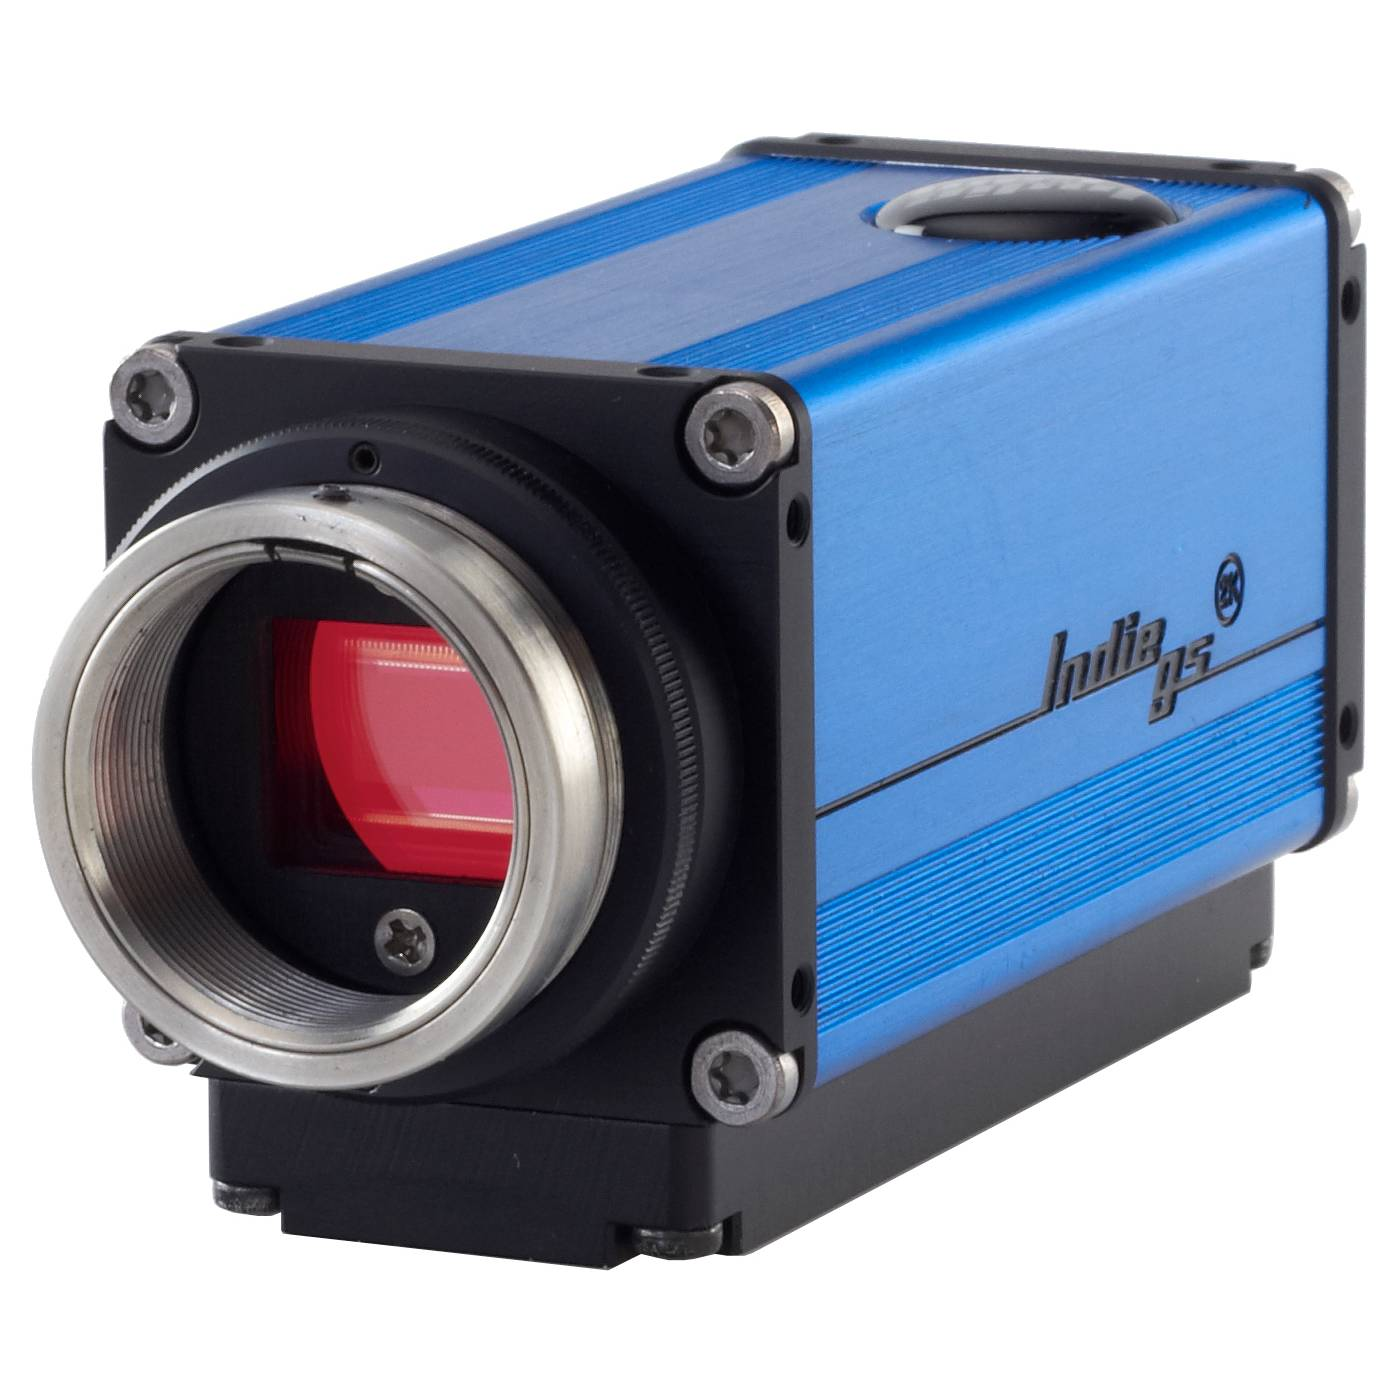 UrbanFox TV Blog: IndieGS2K global shutter camera